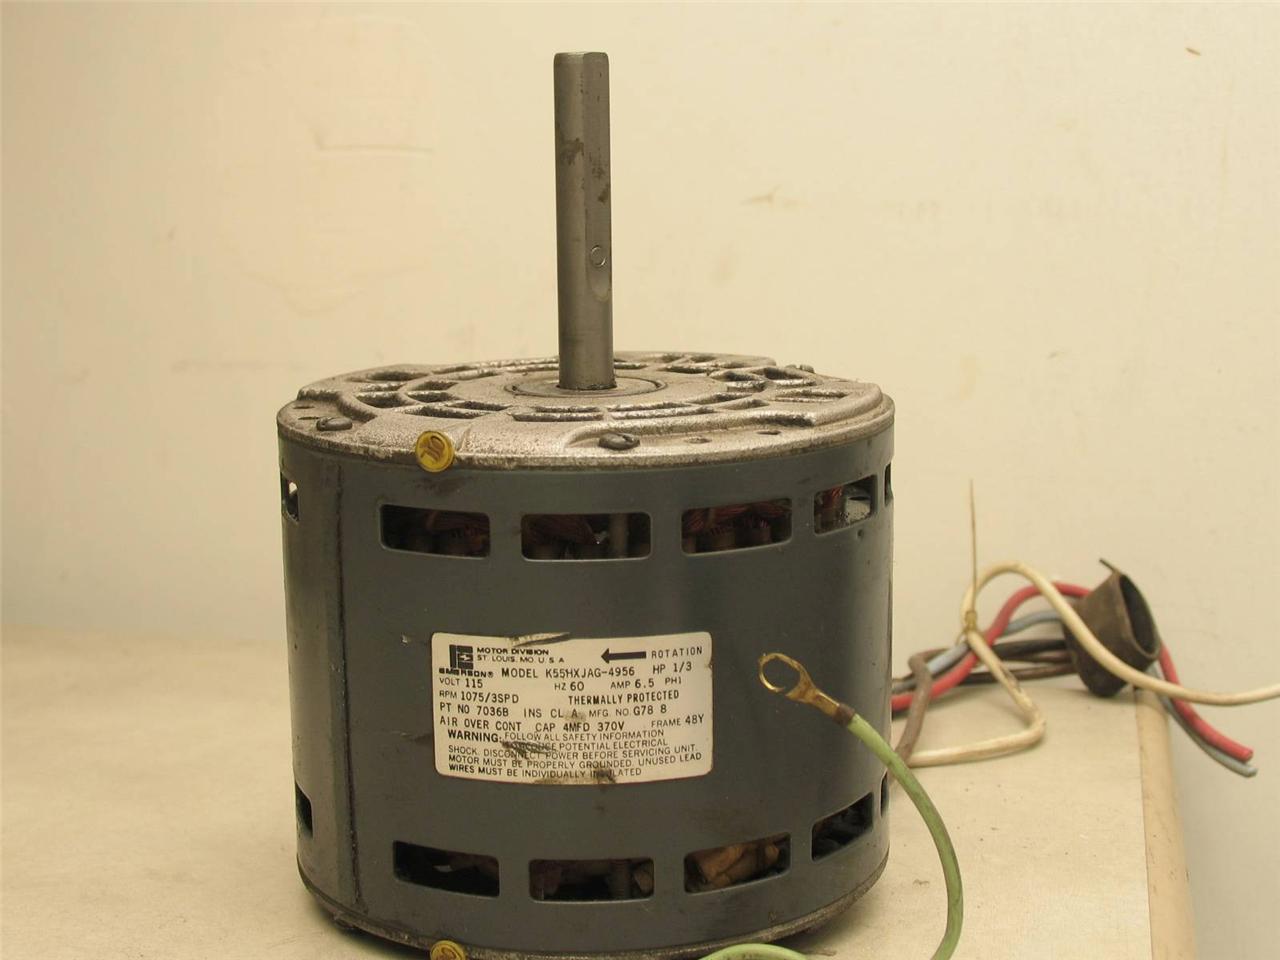 Emerson k55hxjag 4956 furnace blower motor 1 3 hp 1075 rpm for 1 hp blower motor